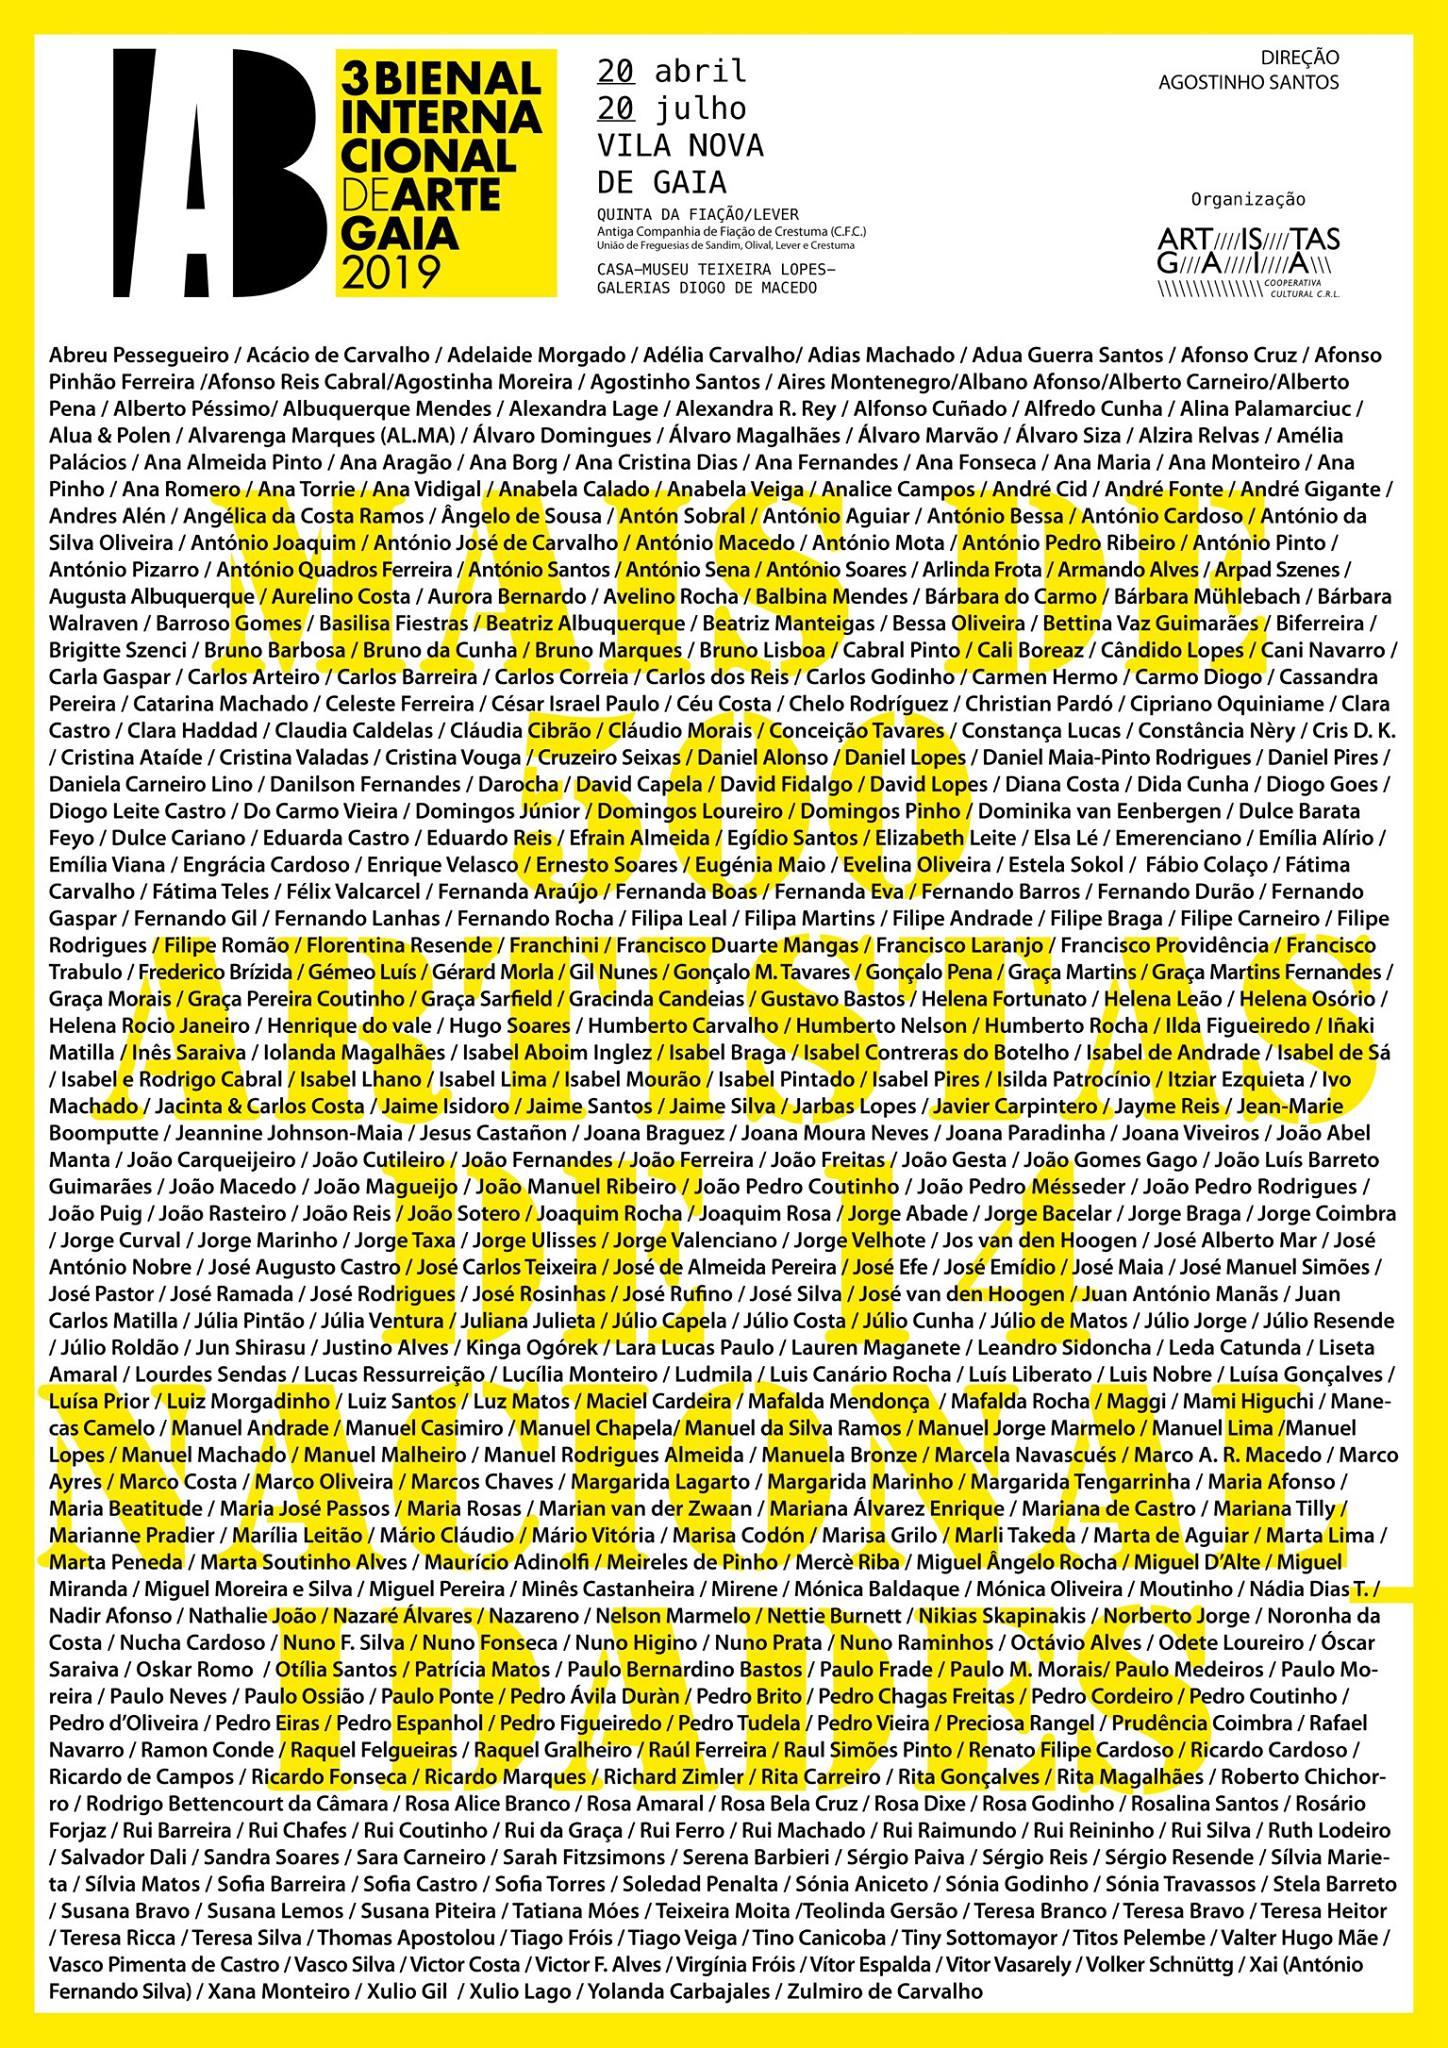 Bienal Internacional de Arte Gaia bonjourmolotov Andre Gigante.jpg